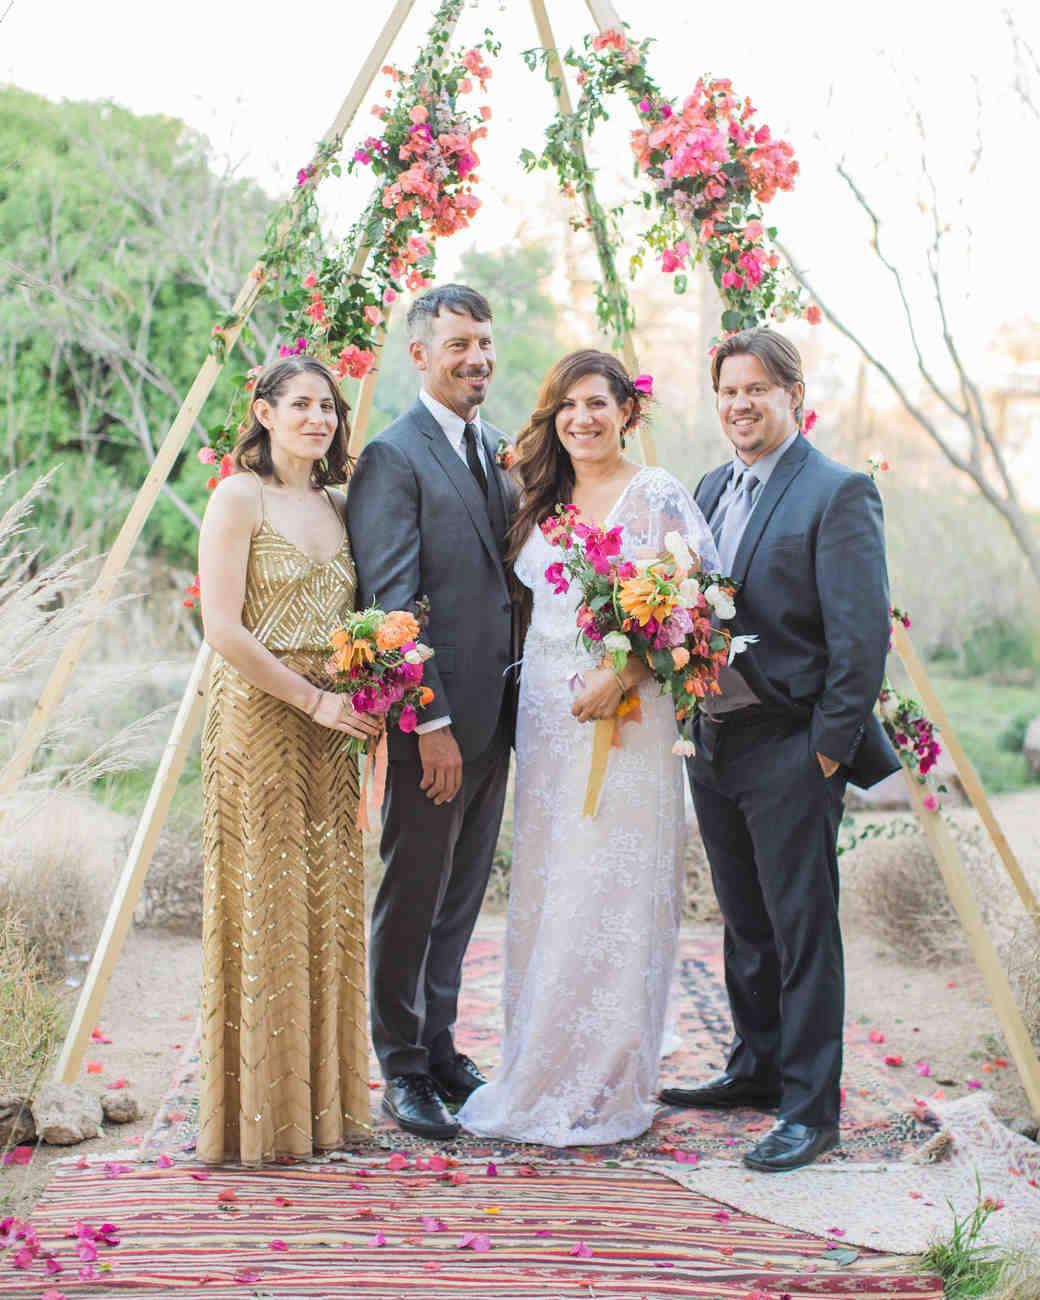 lara-chad-wedding-bridalparty-563-s112306-1115.jpg